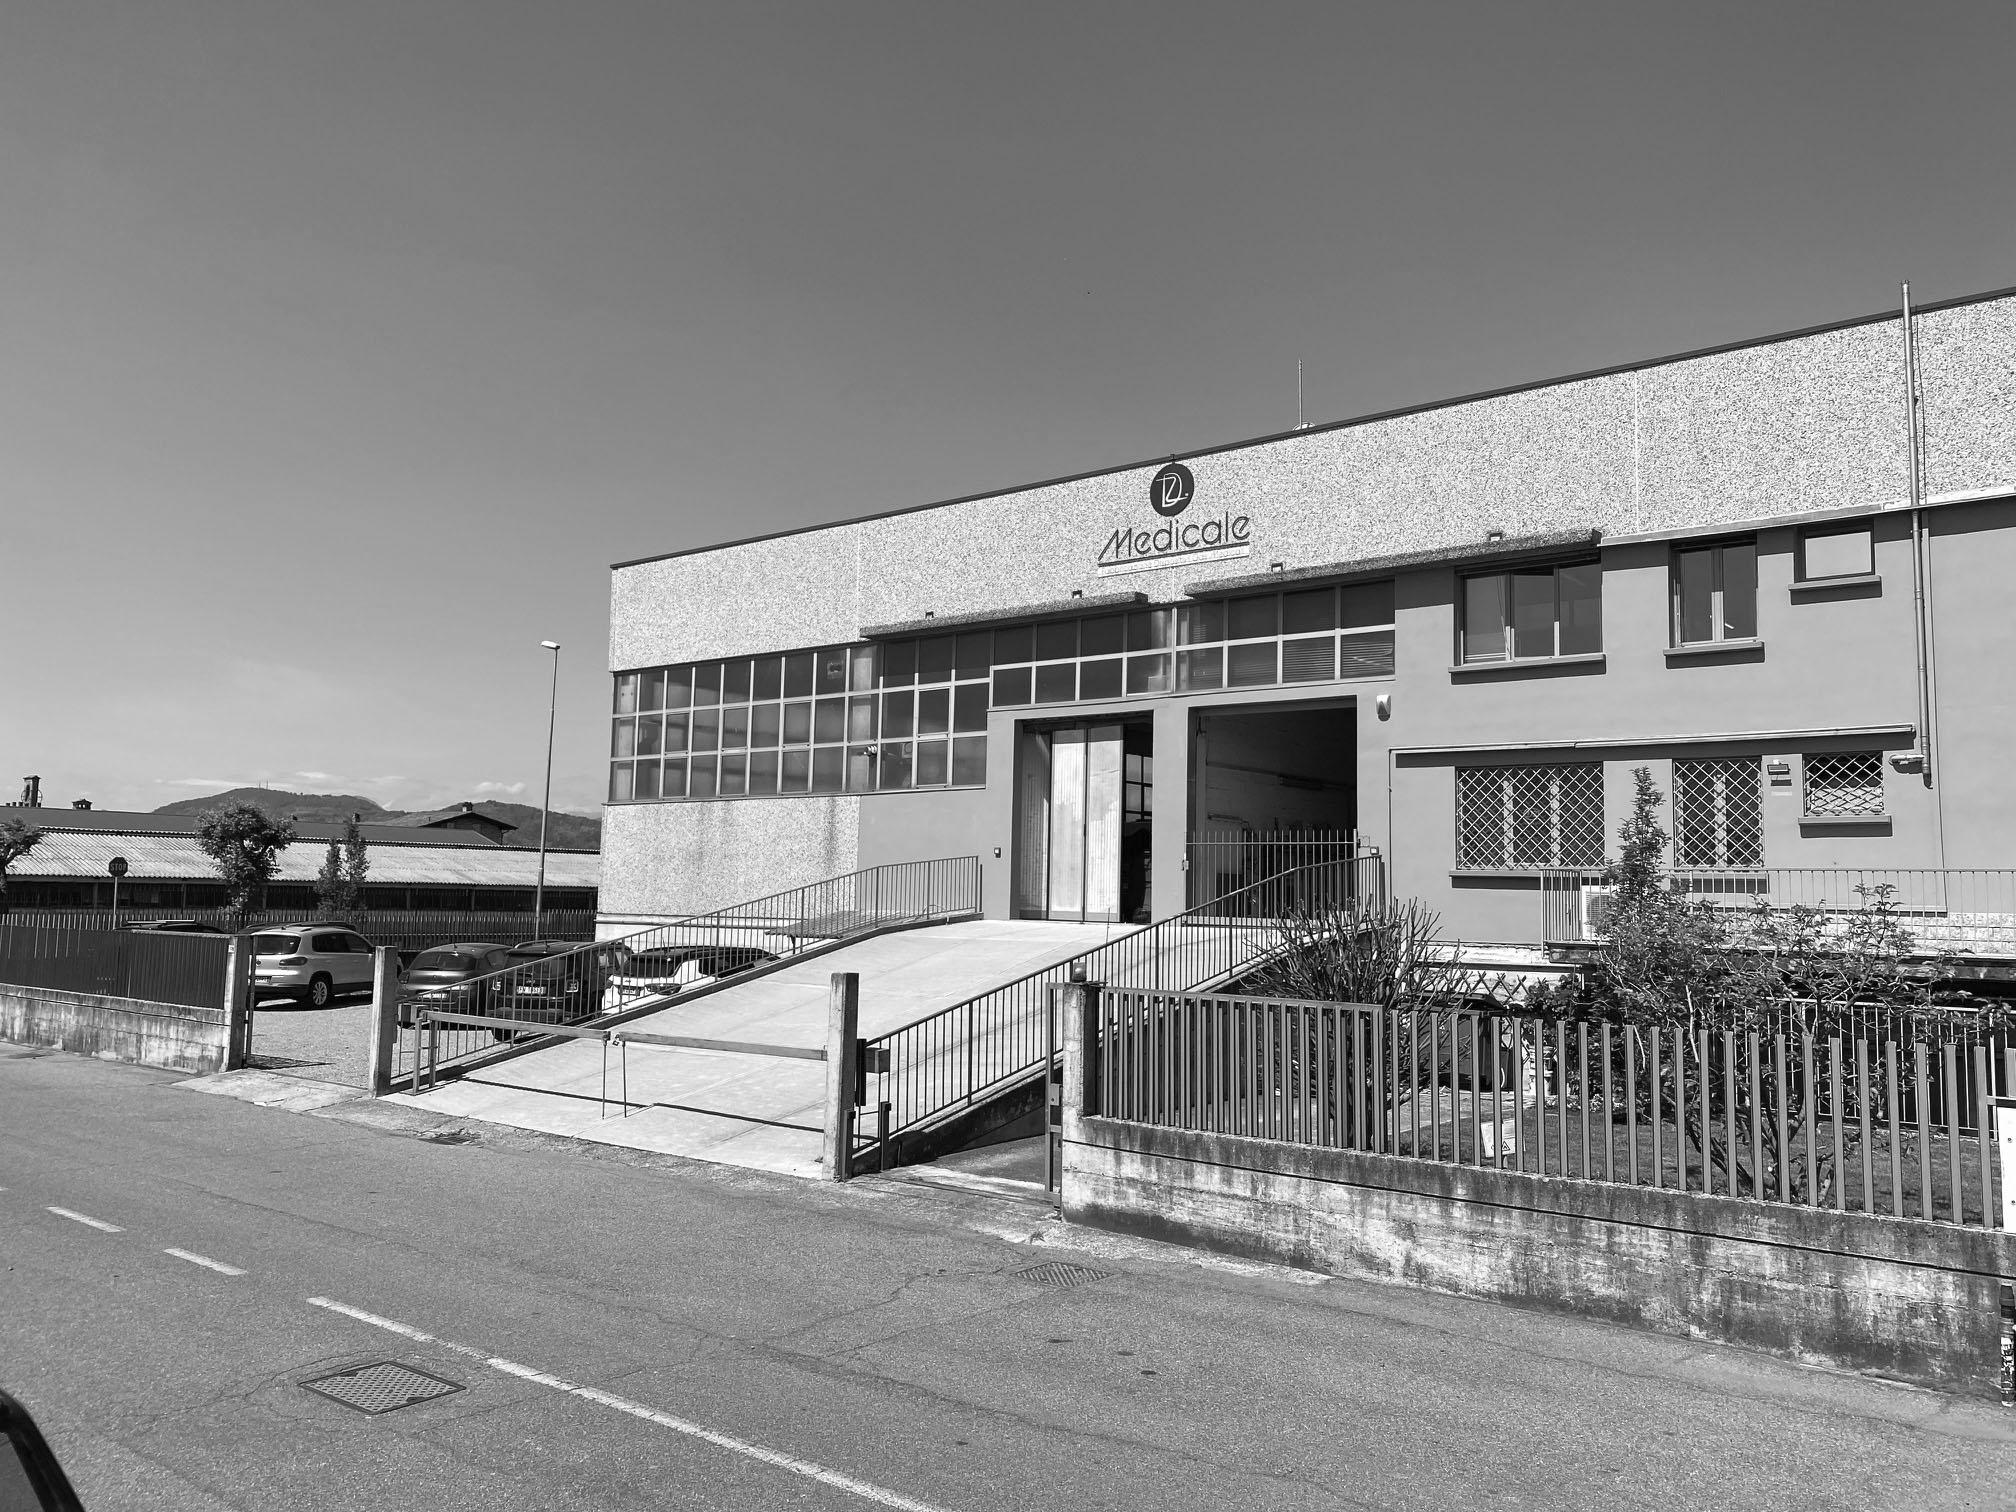 dz medicale - factory